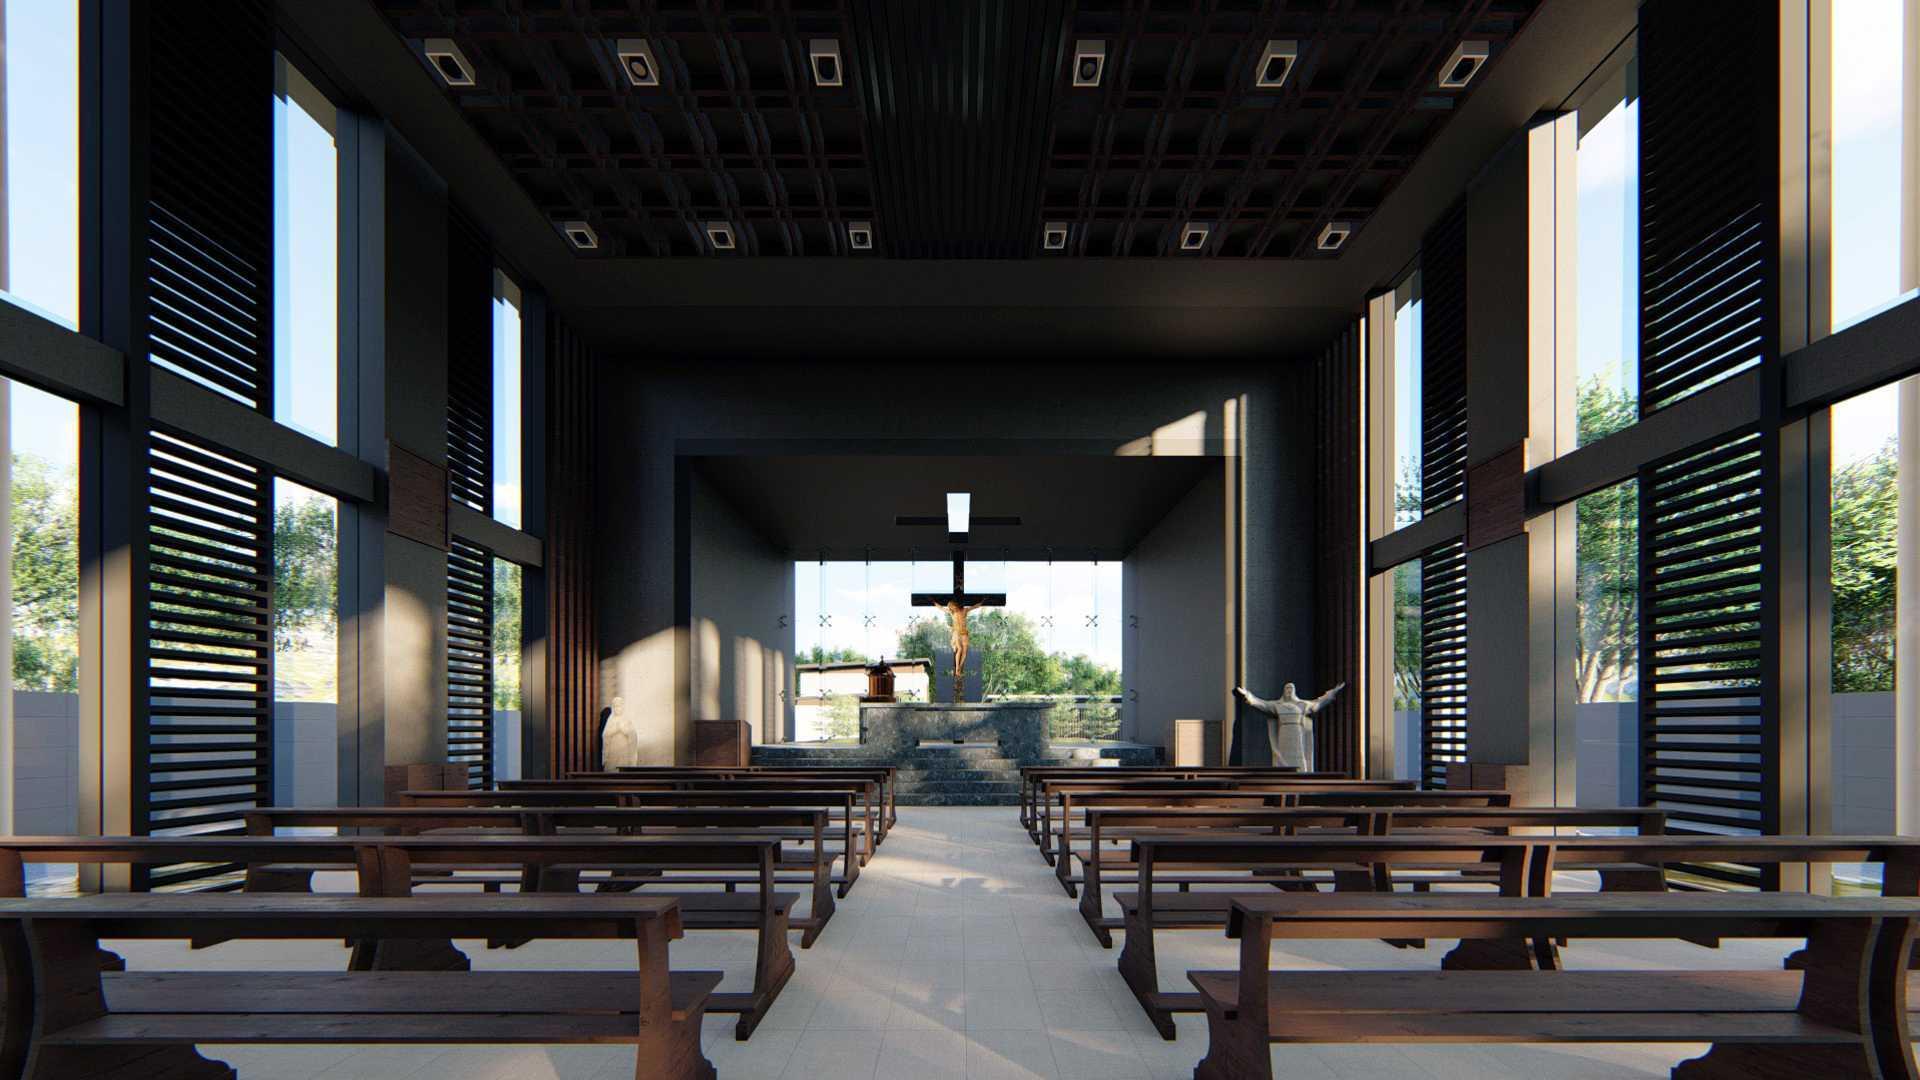 Aeternite Saint Mary Church Comal, Kabupaten Pemalang, Jawa Tengah, Indonesia Comal, Kabupaten Pemalang, Jawa Tengah, Indonesia Aeternite-Saint-Mary-Church  56492